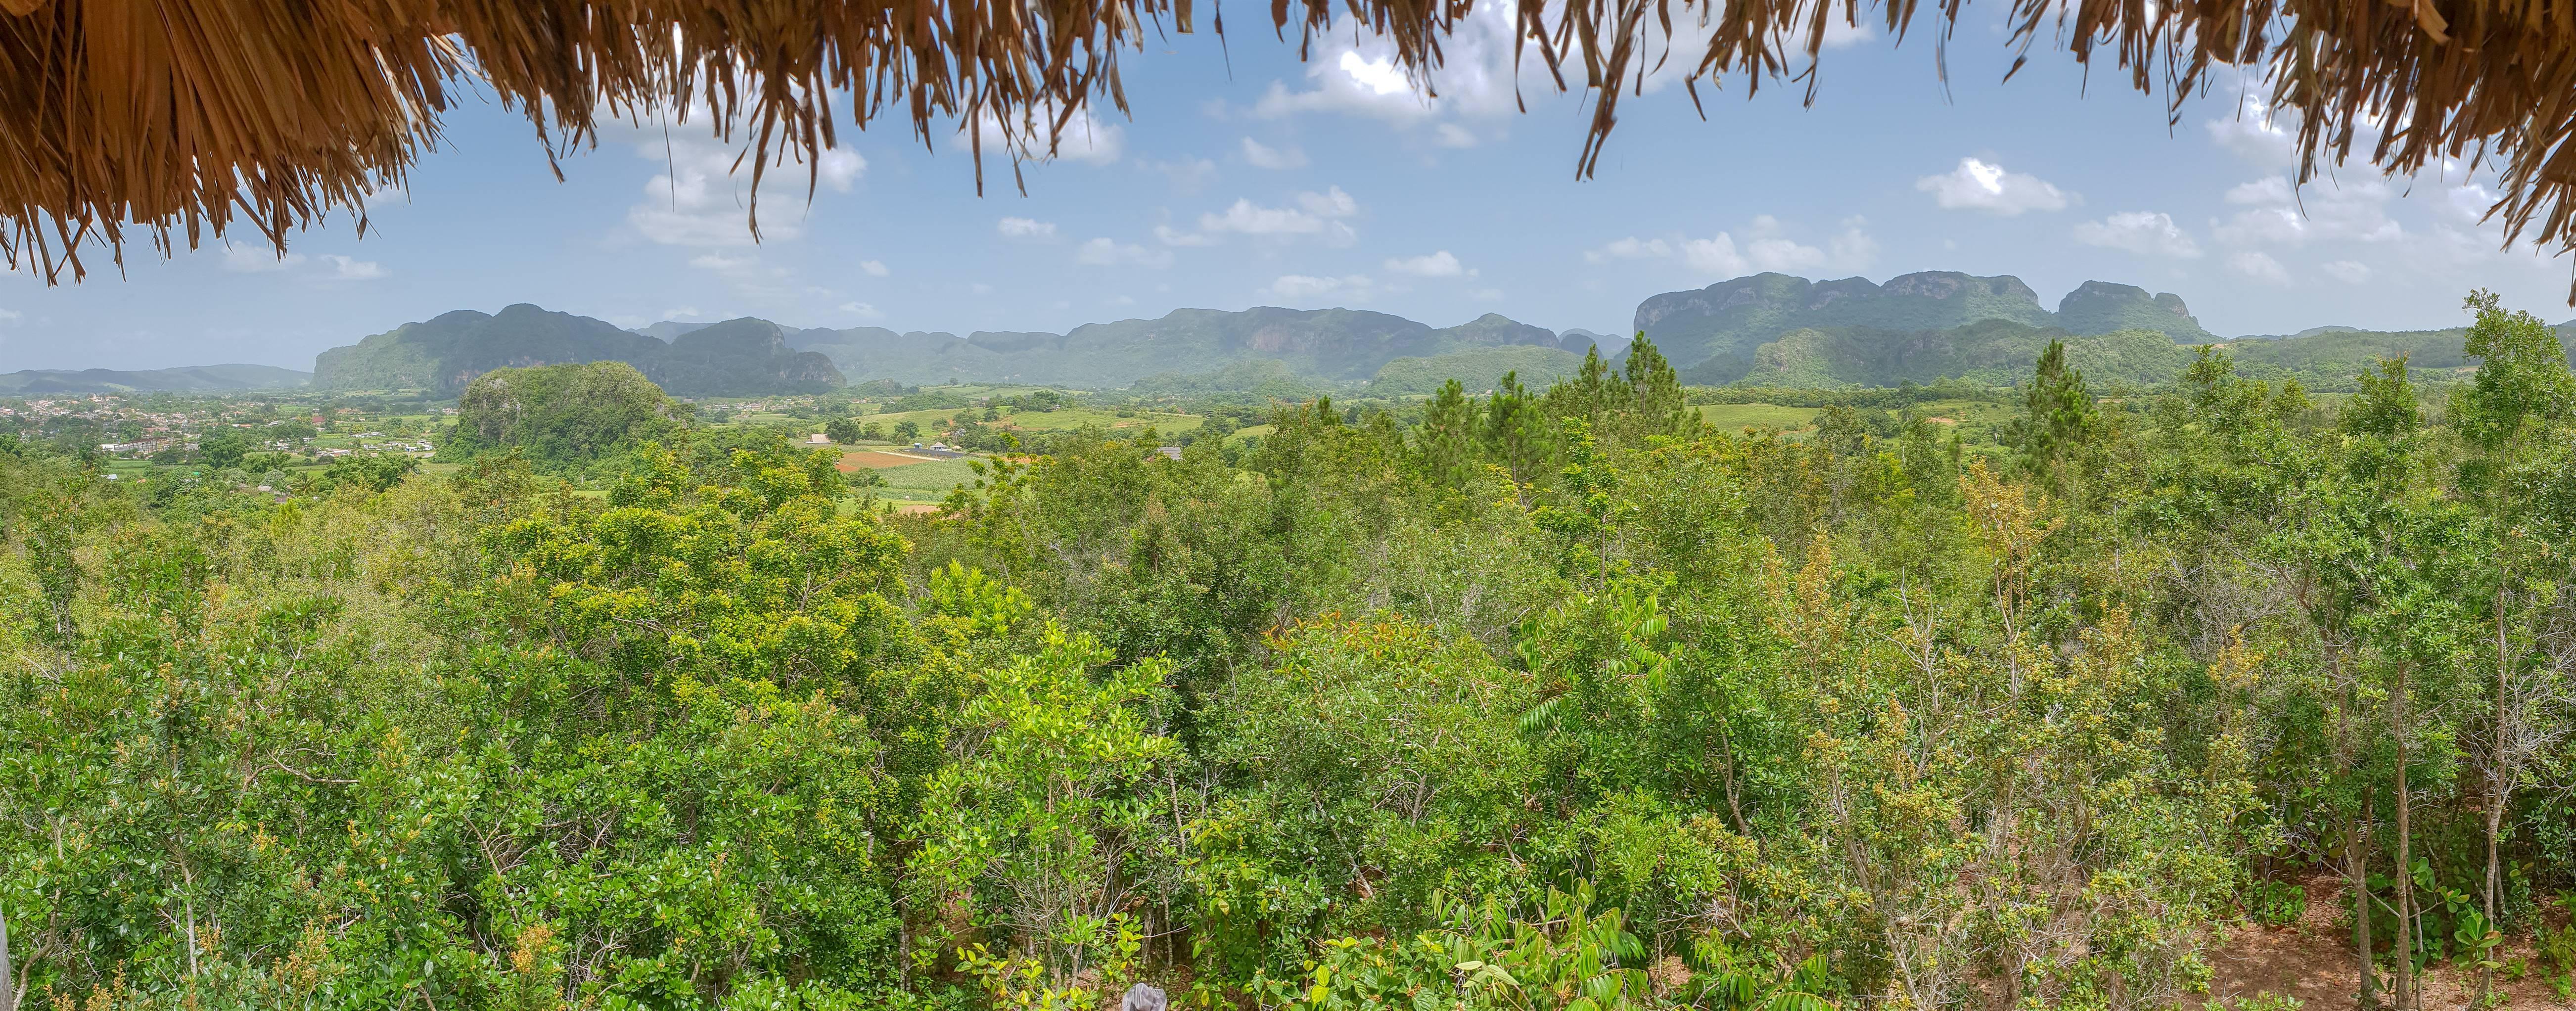 Vallée de Vinales, Cuba